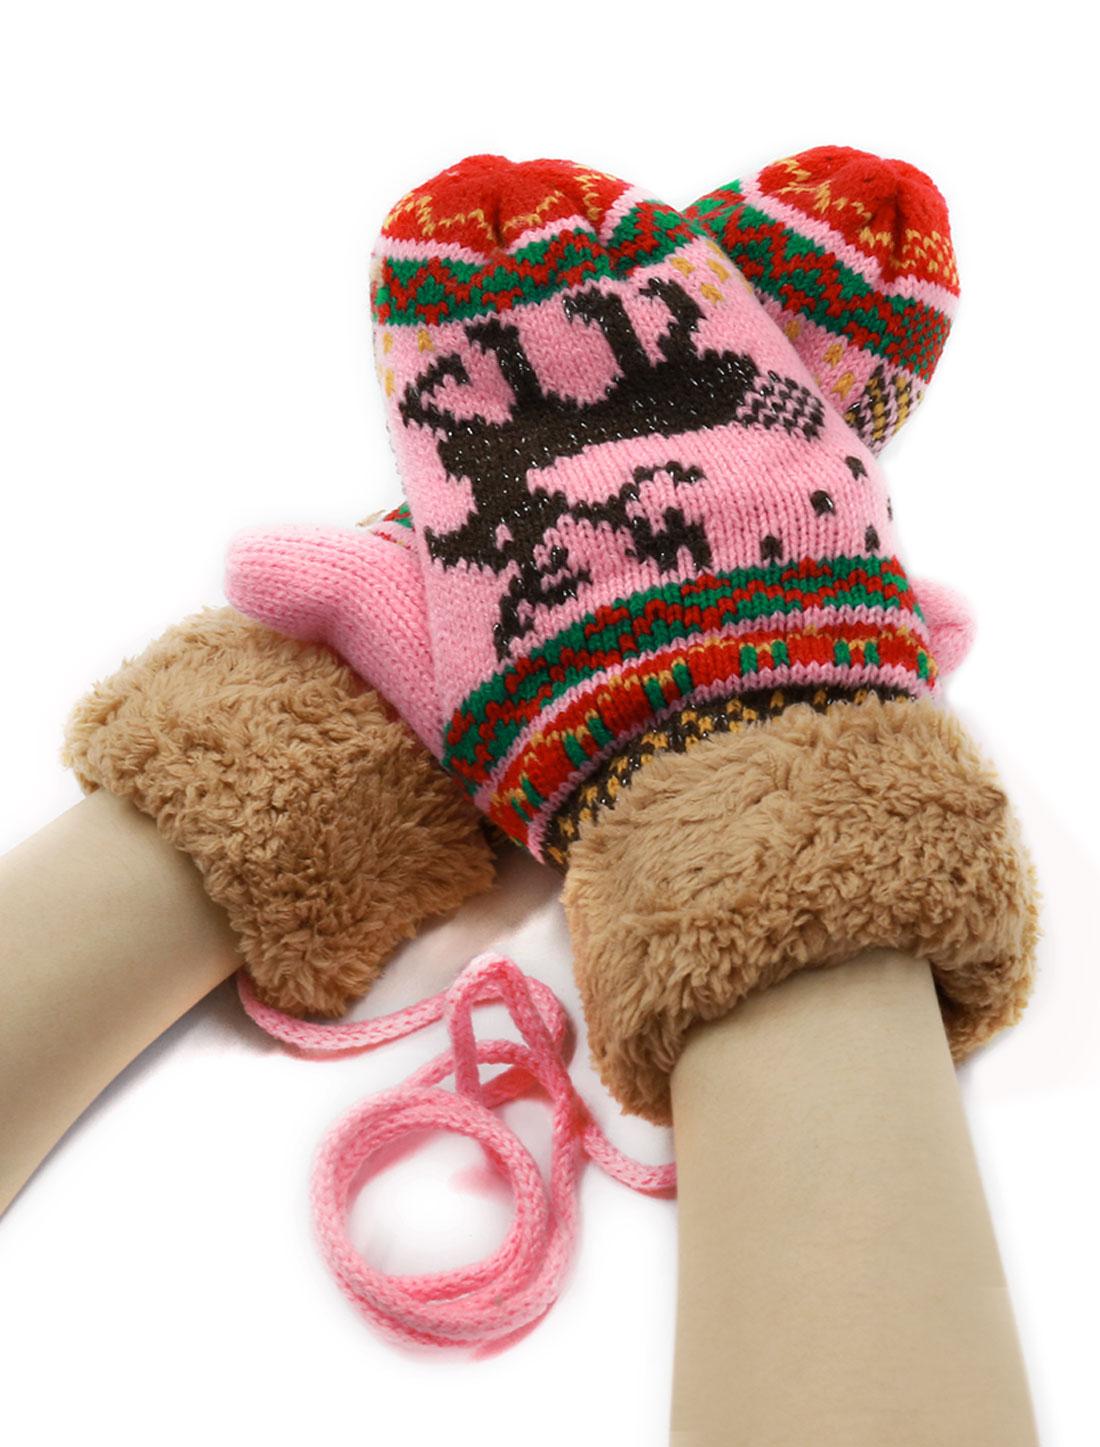 Ladies Plush Panel Deer Pattern Knitted Hand Warm String Gloves Pink Pair